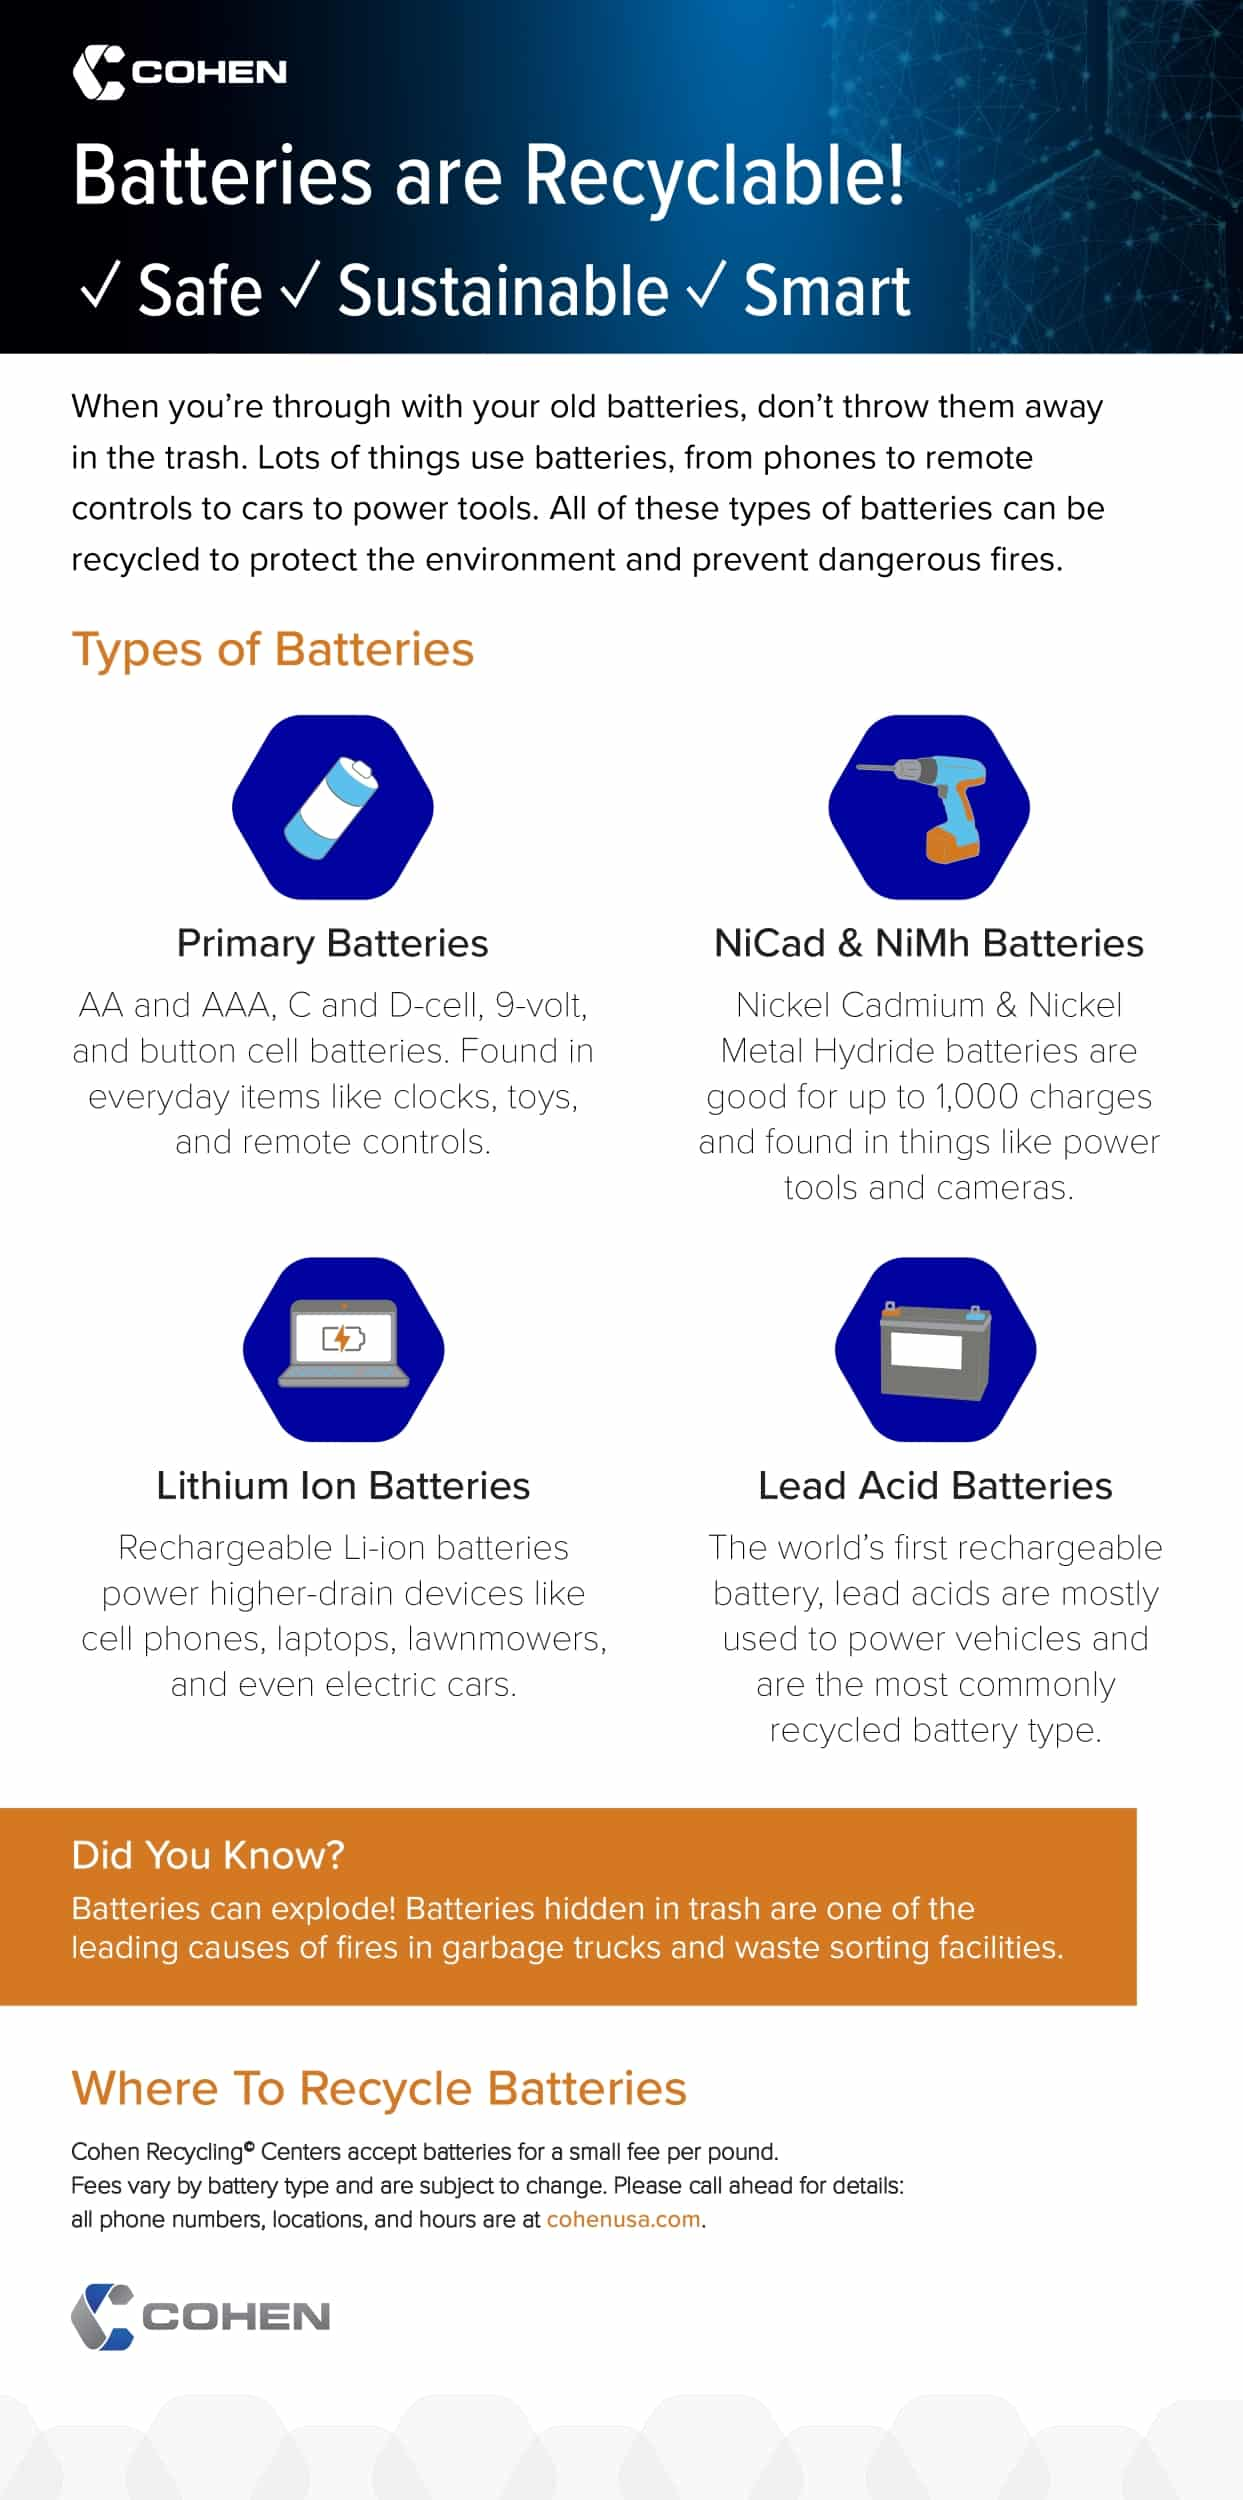 infographic describing battery recycling